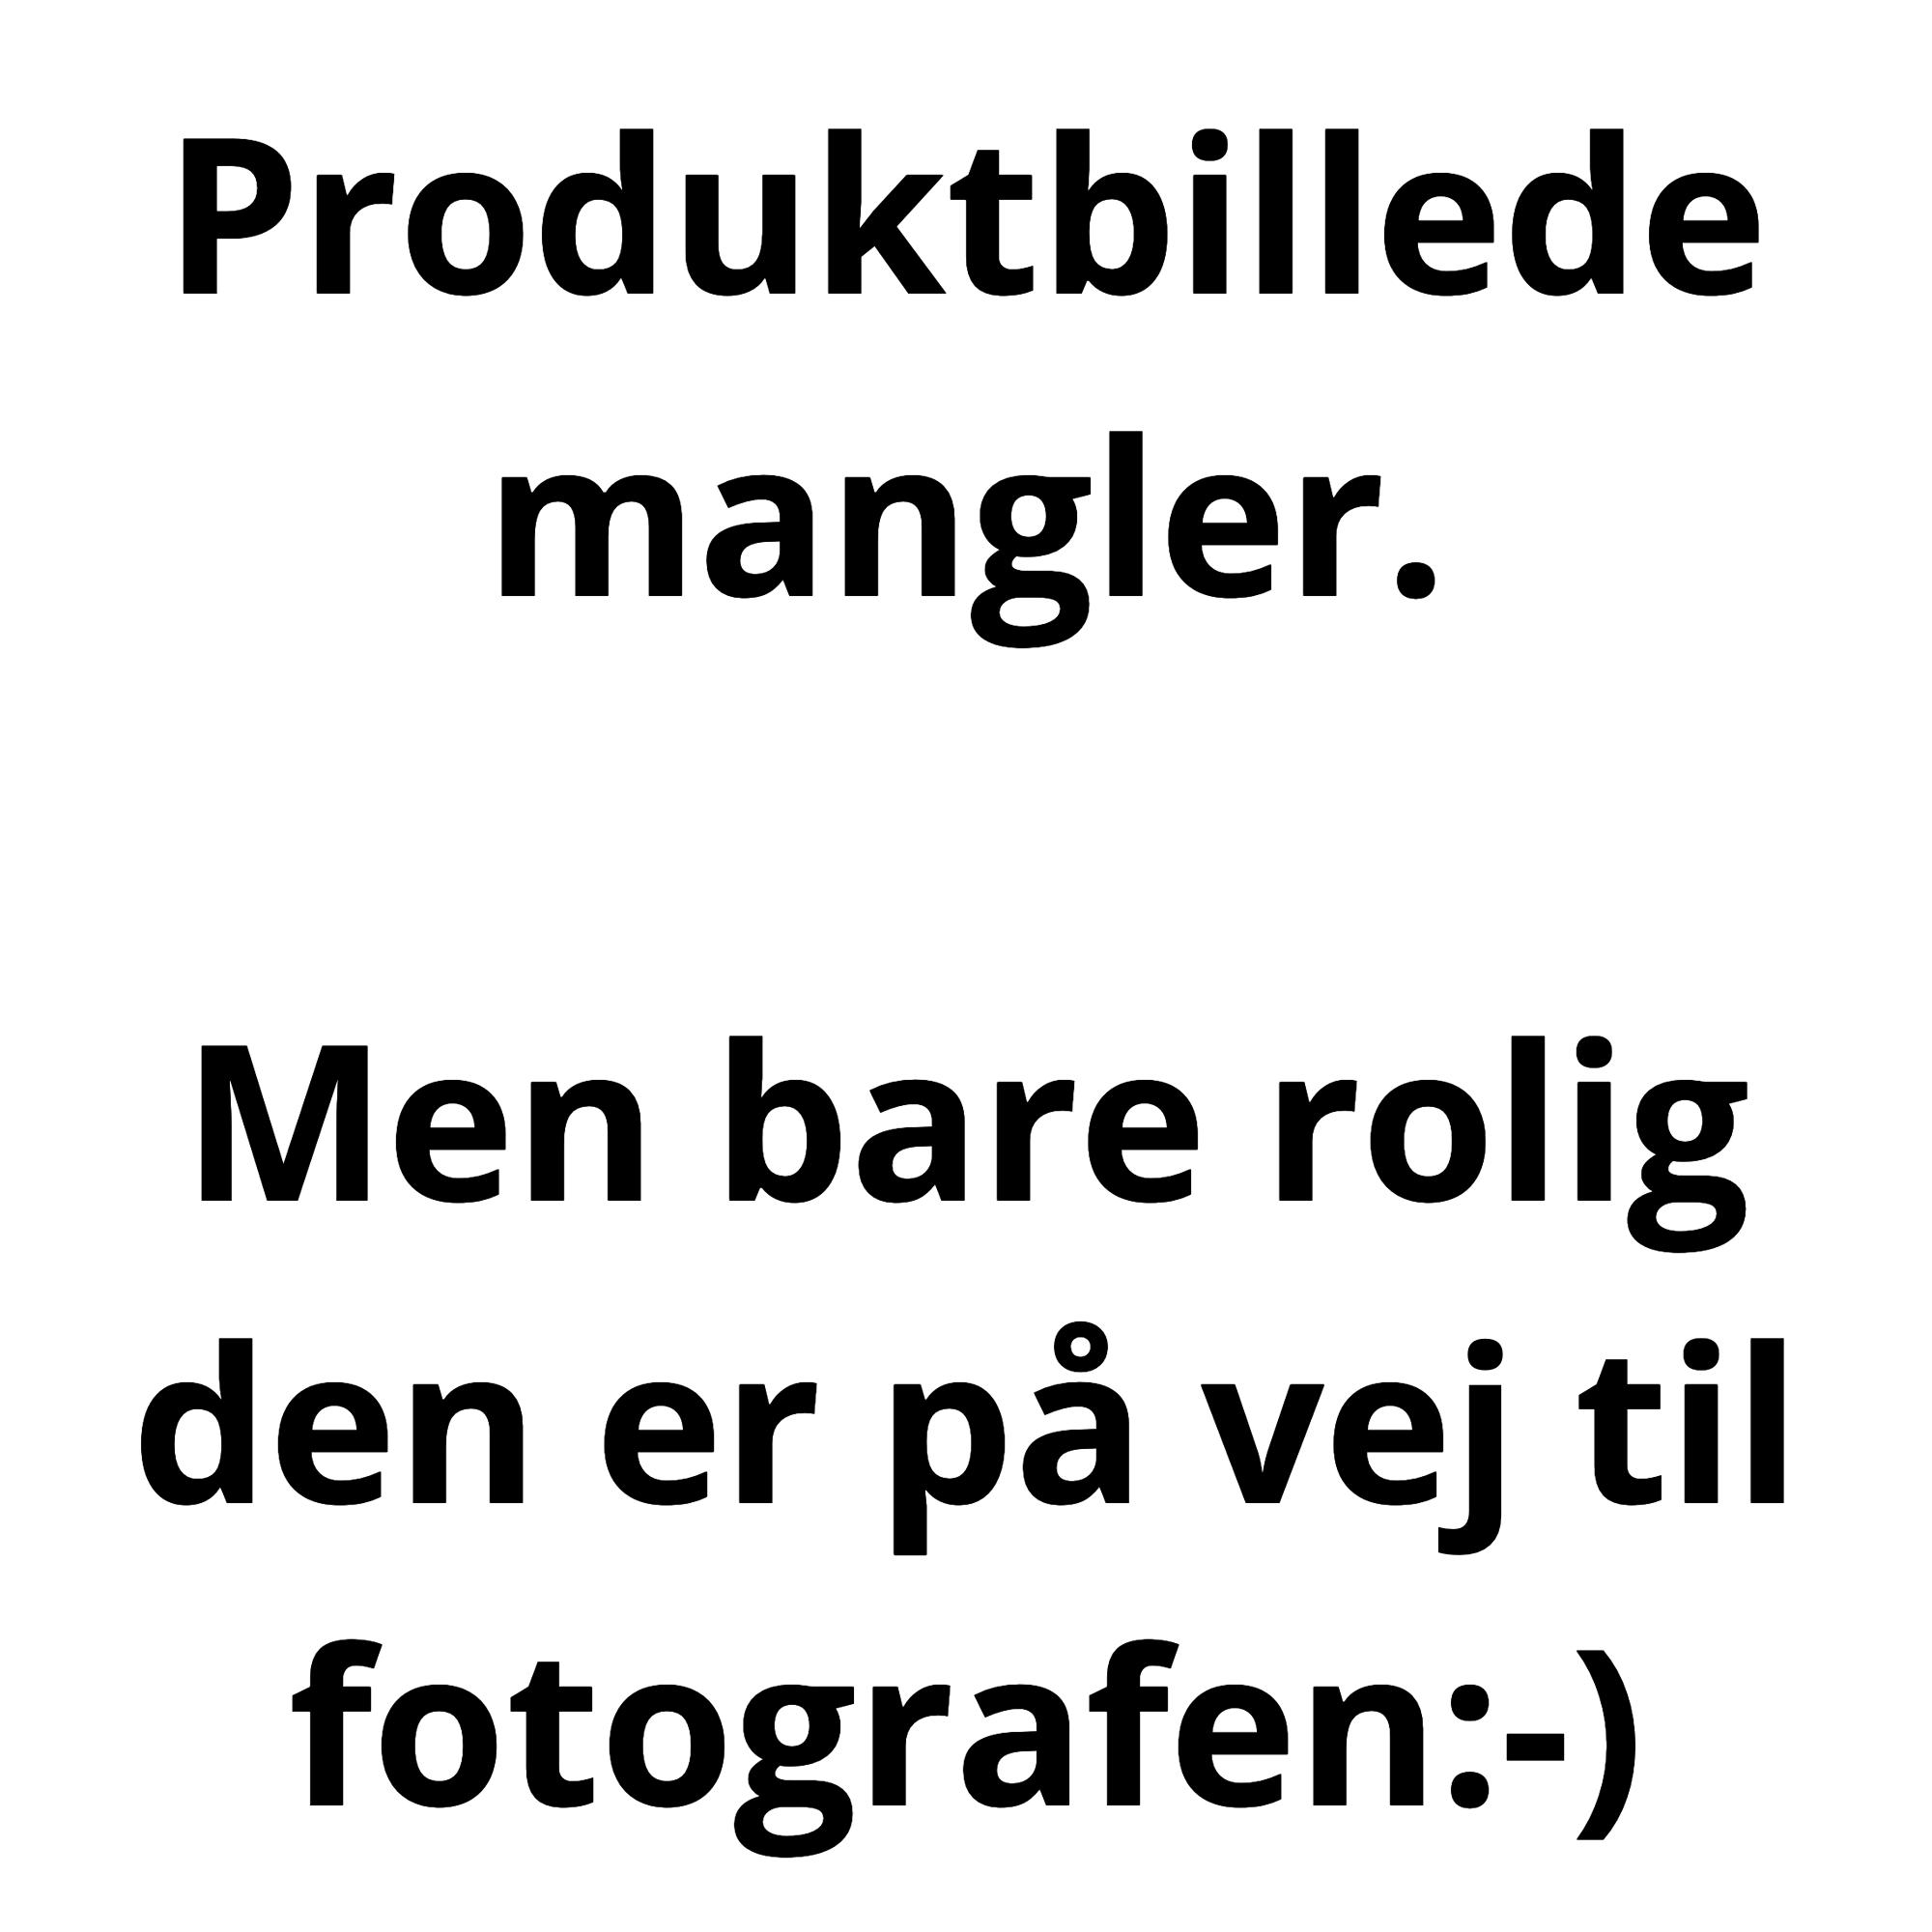 Brodit Aktiv Mobilholder med cigar adapter til Apple iPhone 6 Plus/6S Plus/7 Plus/8 Plus/X/Xs/Xs Max B:75-89 D:6-10mm - 521667